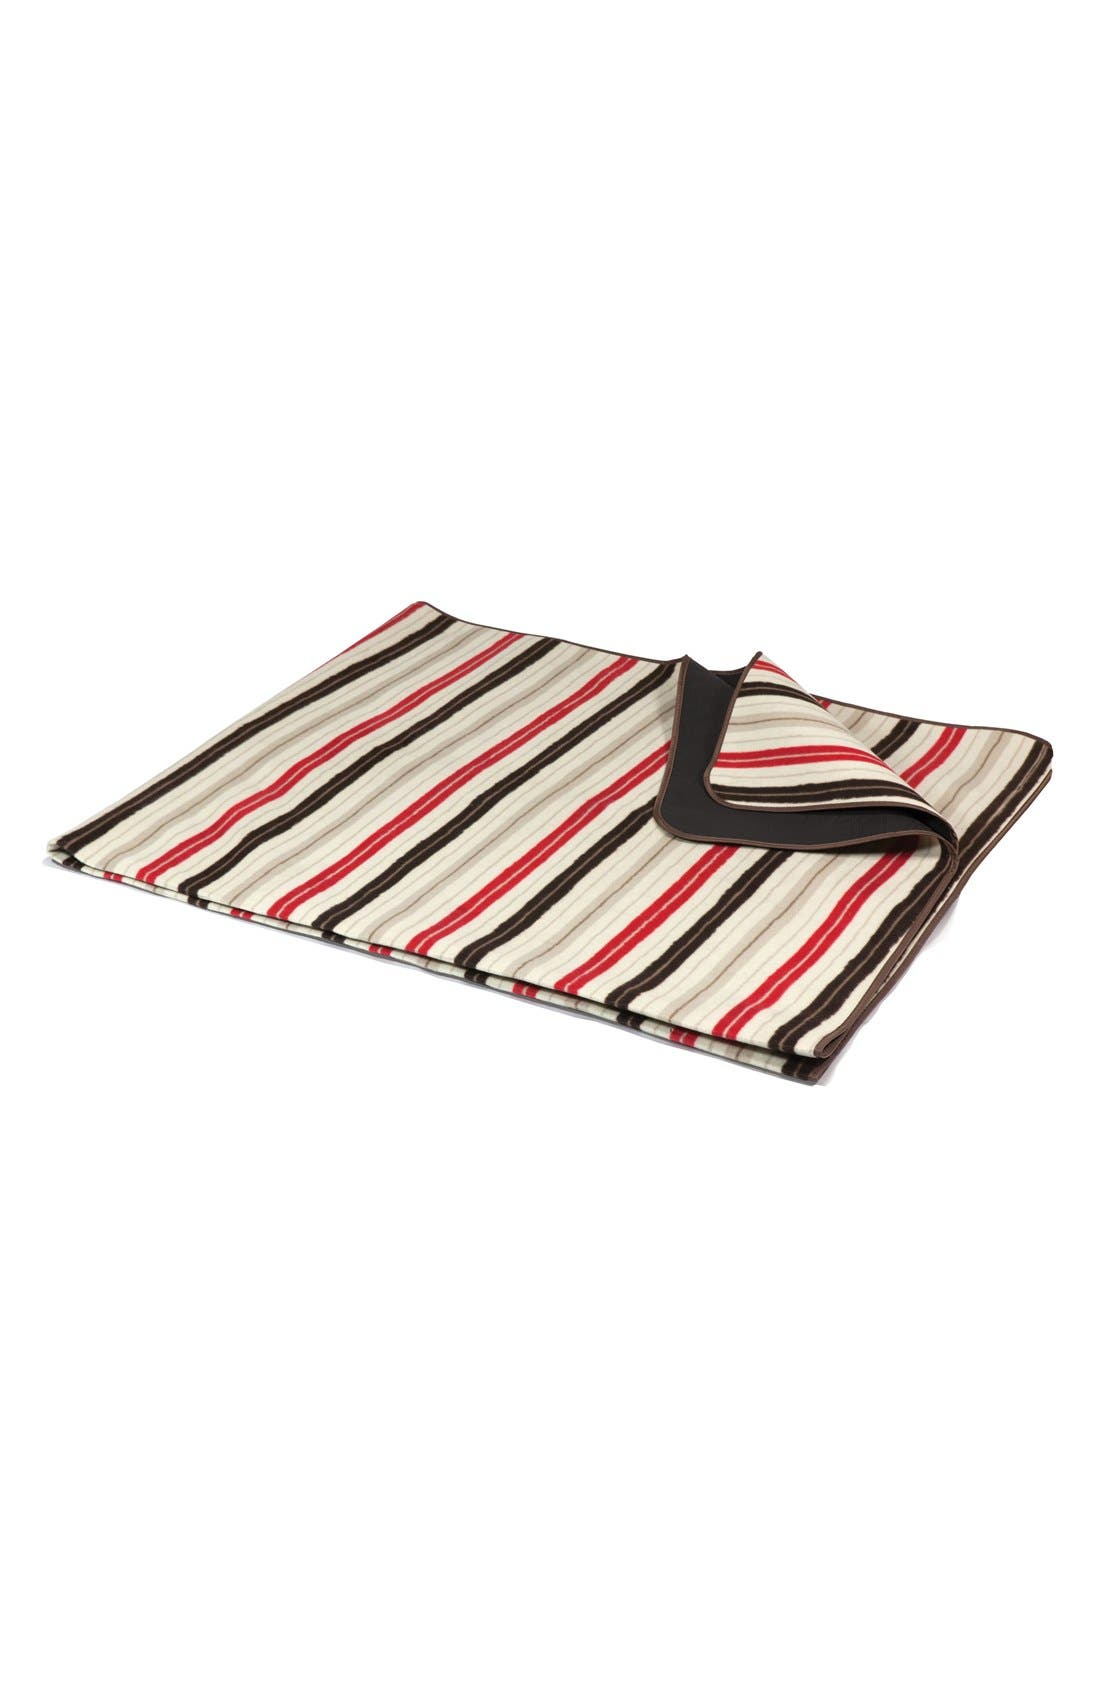 'XL' Blanket Tote,                         Main,                         color, Brown